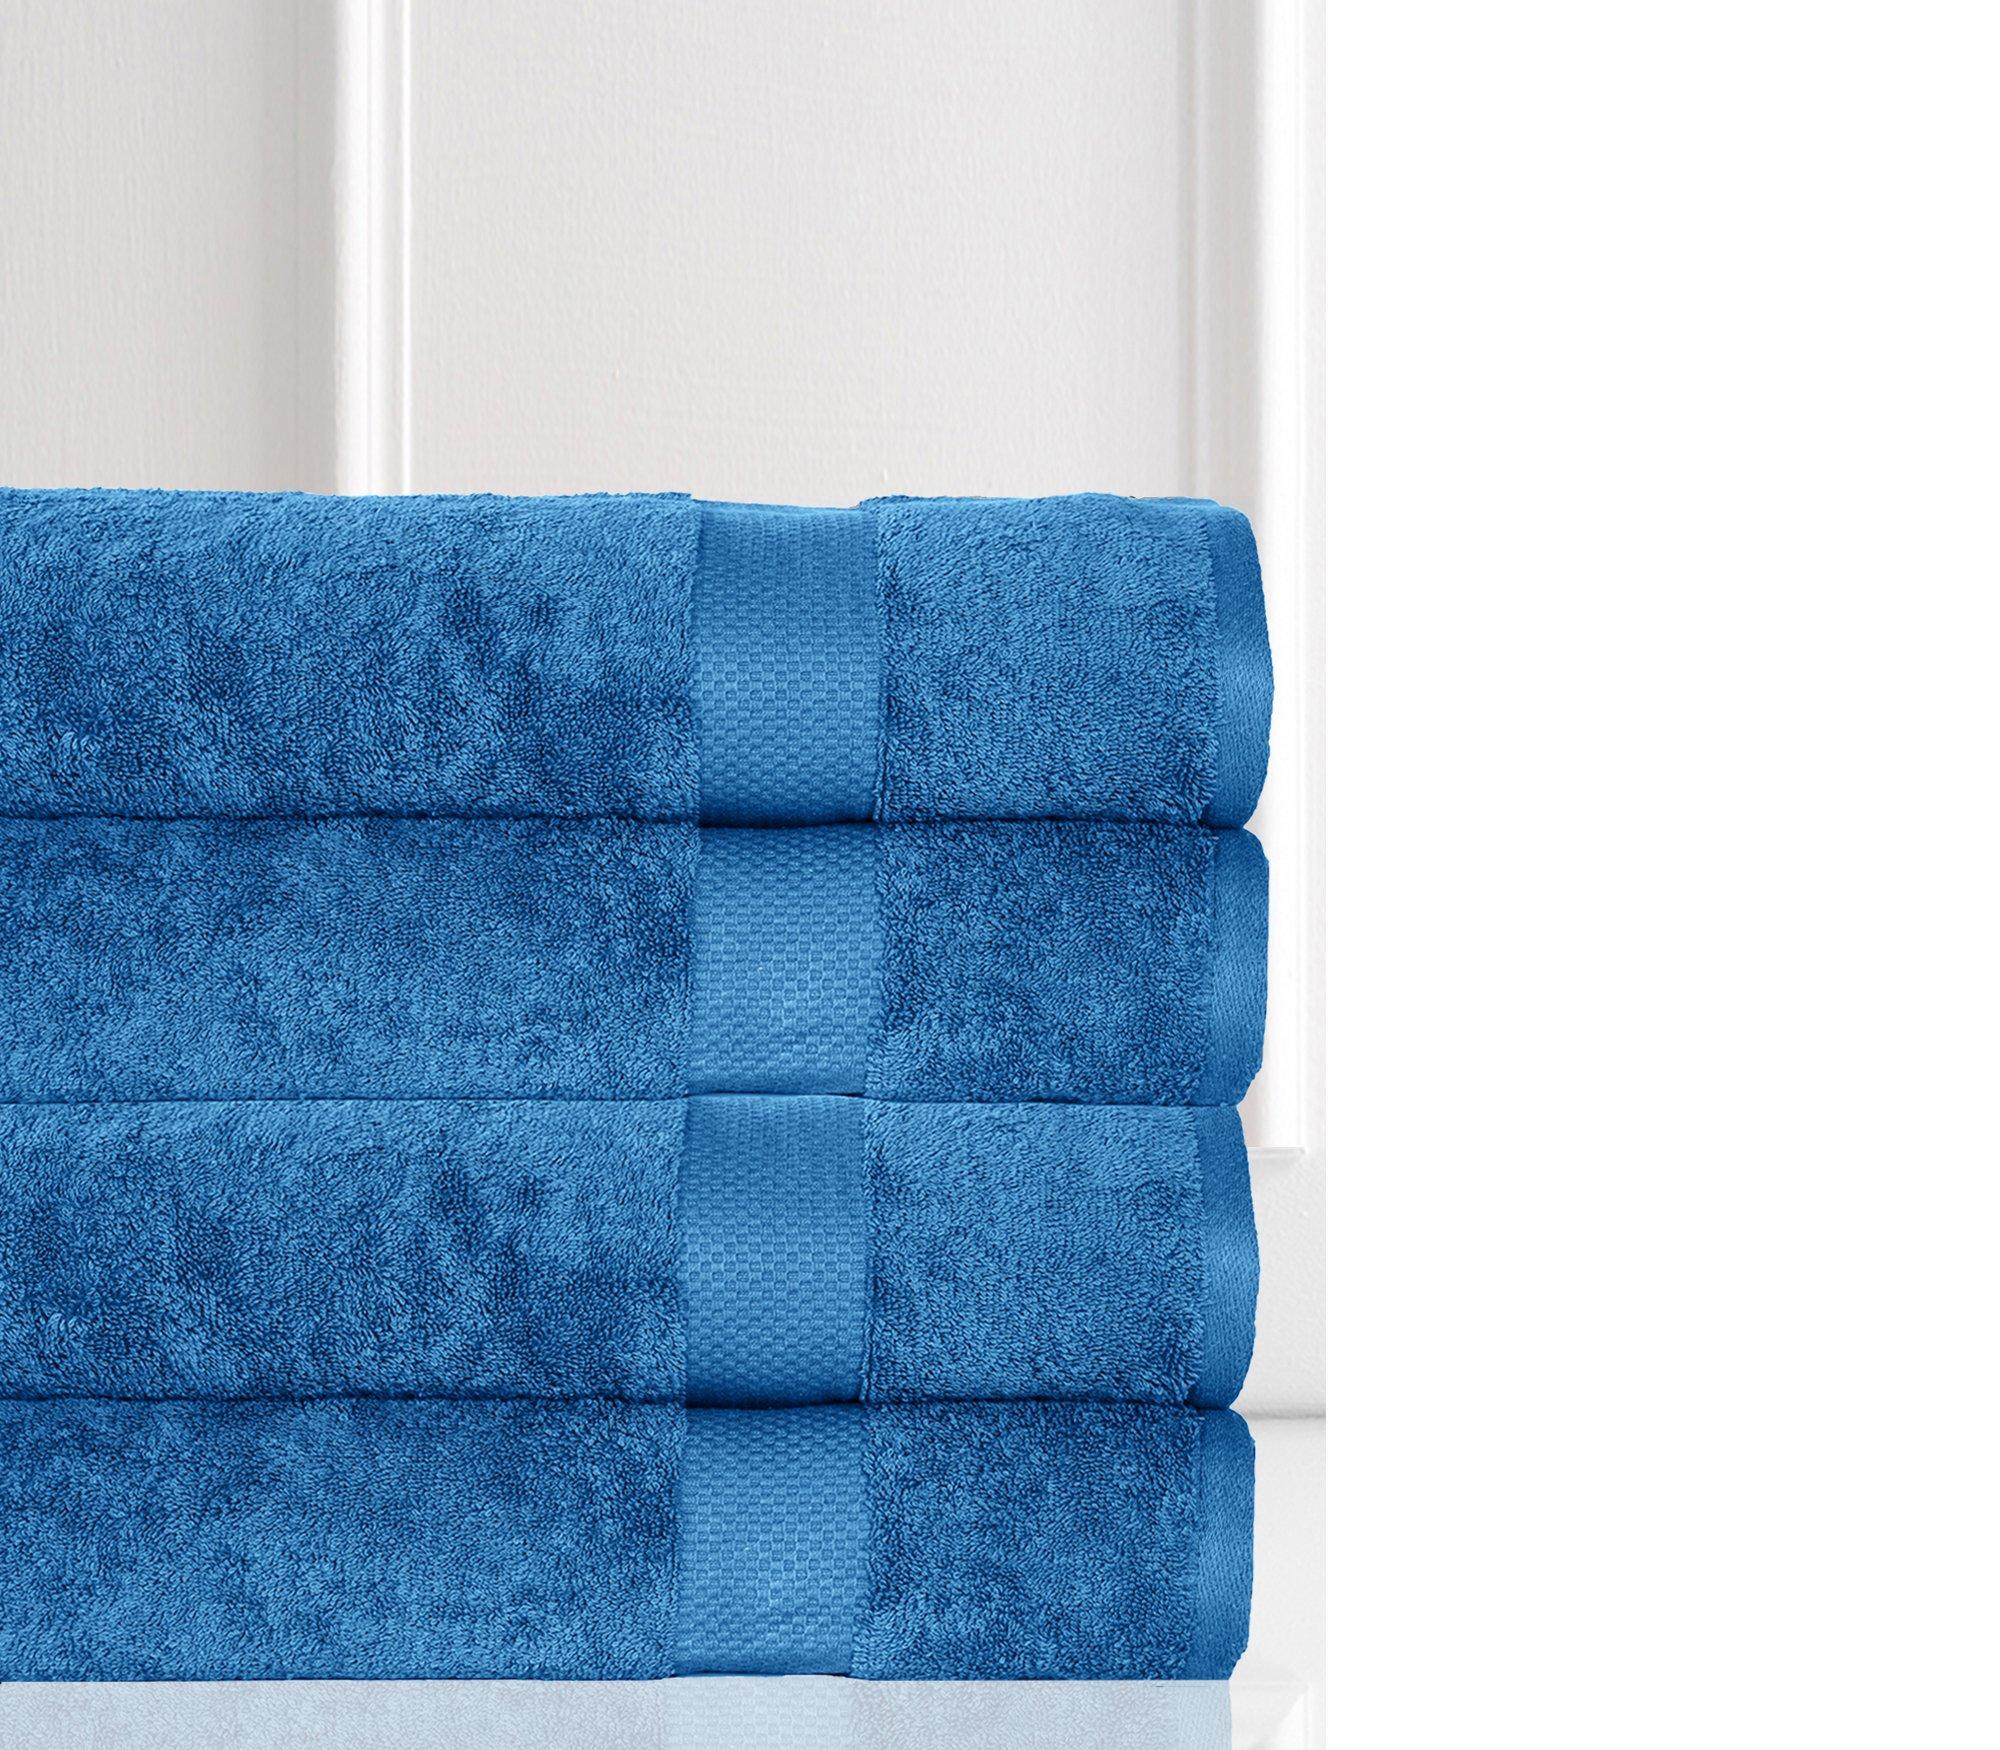 Casa Platino Elegance Spa ESP4 100% Combed Cotton Oversized 4 Piece Bath Sheets, Blue Stone by Casa Platino (Image #2)